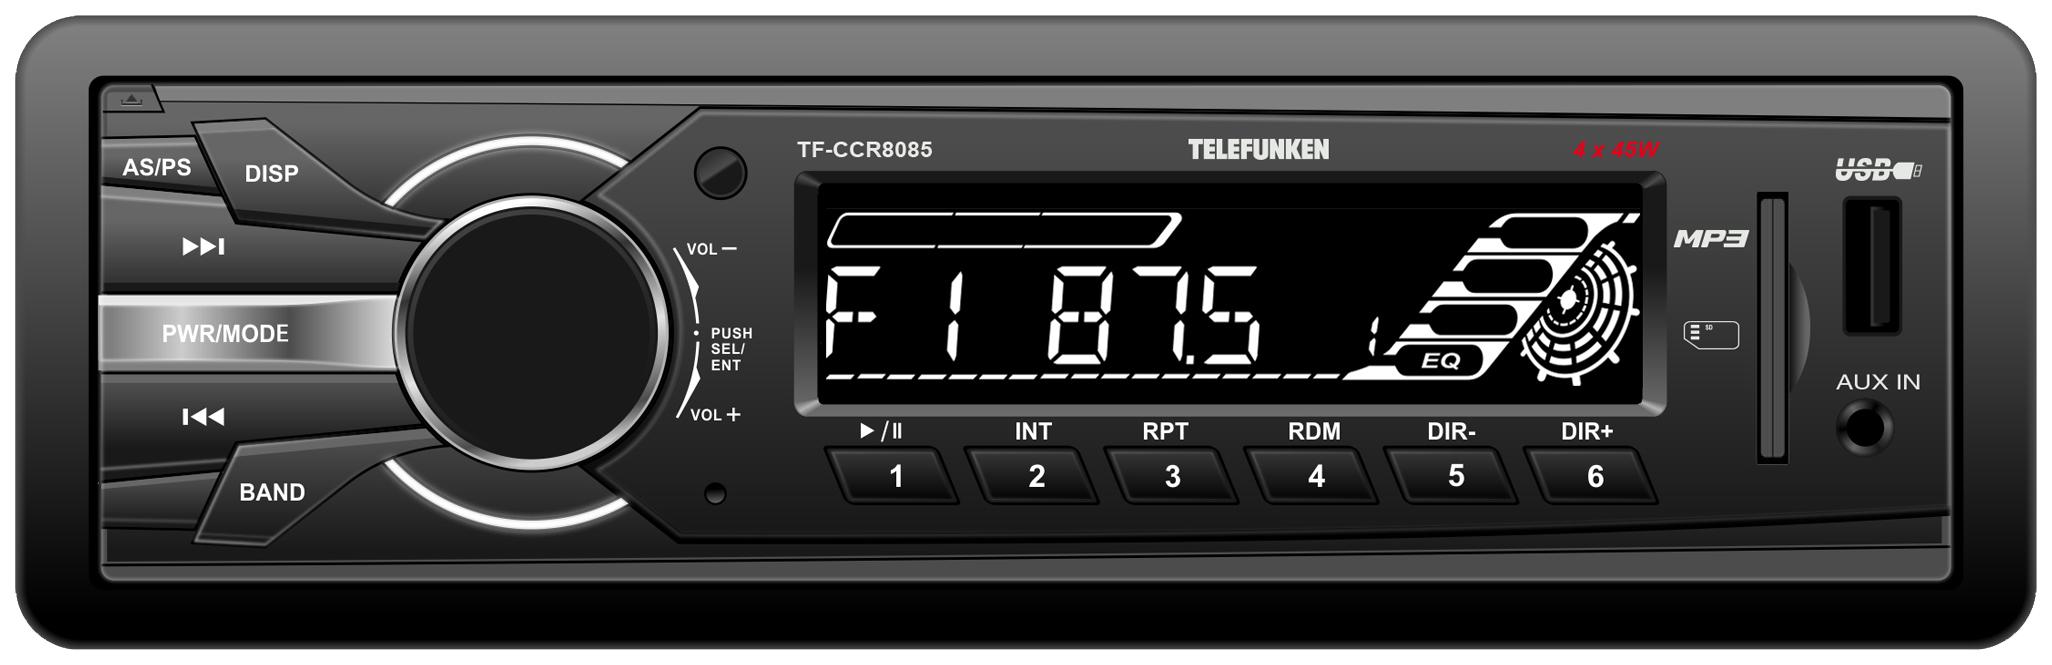 CAM Telefunken TF-CCR8085